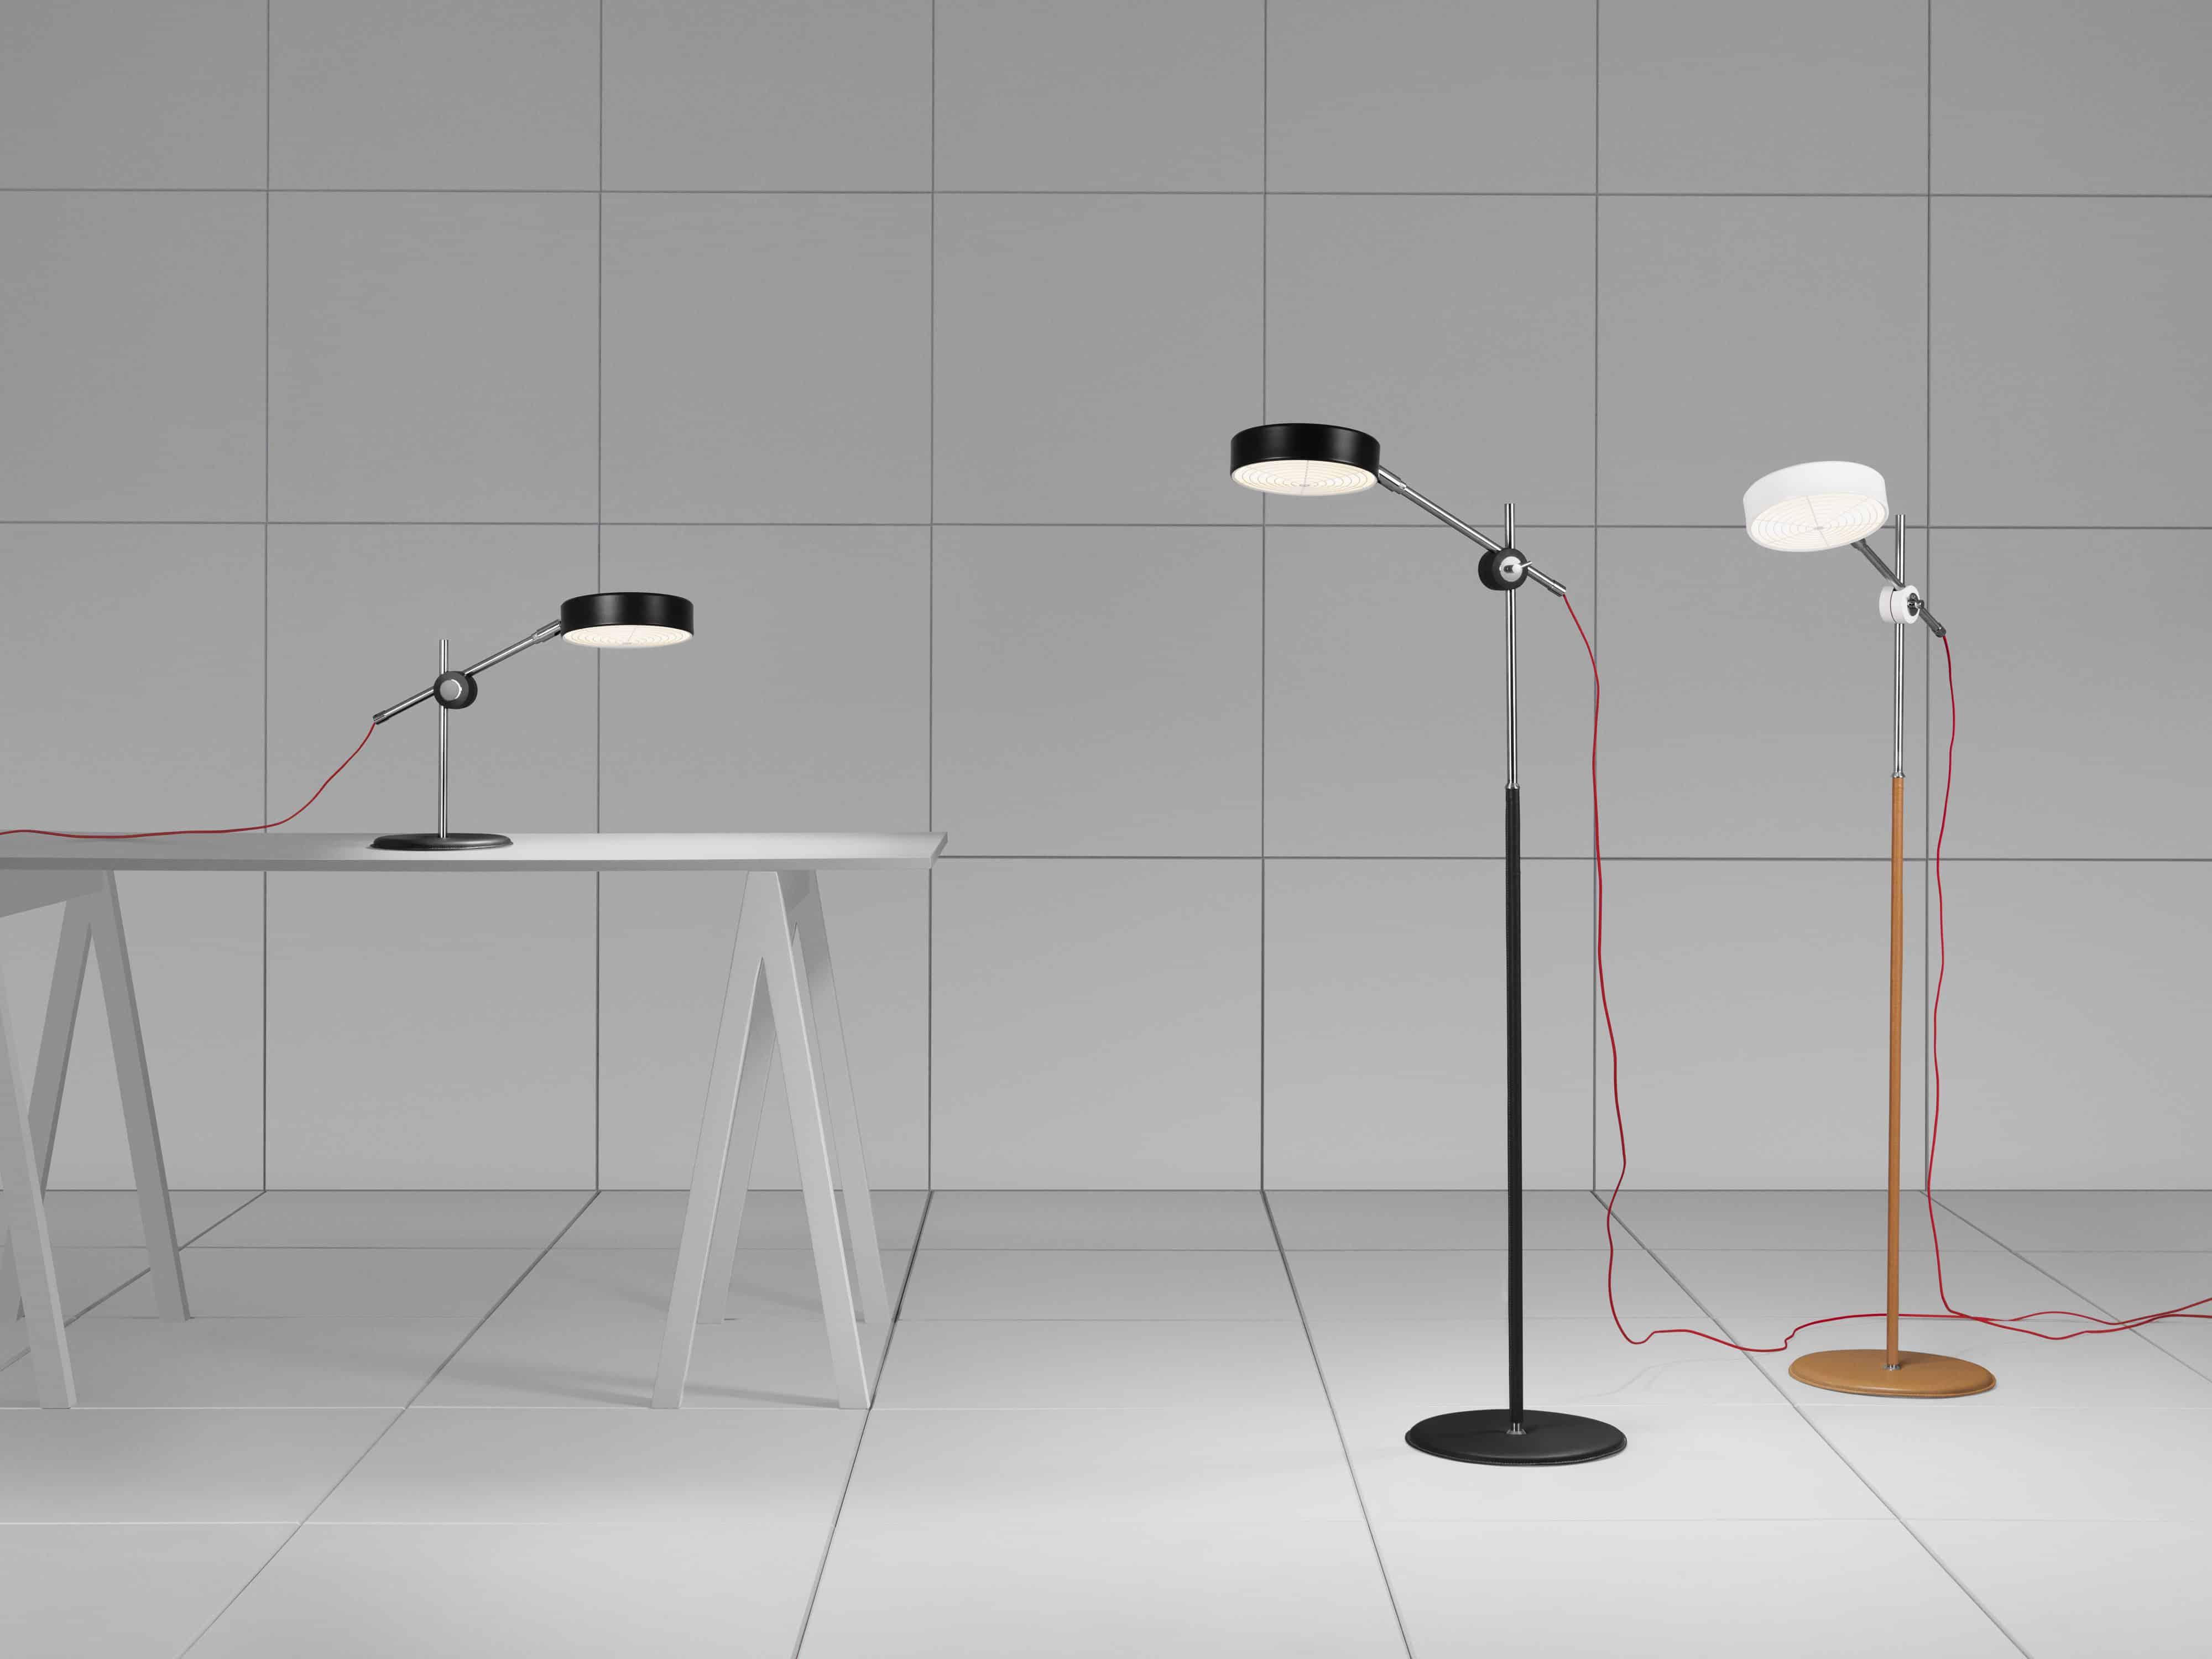 Bumling Golvlampa Raster - Bumling Lampa Cheap Sngbord Runt Lampa With Bumling Lampa Fabulous Brun Bumling Taklampa Med